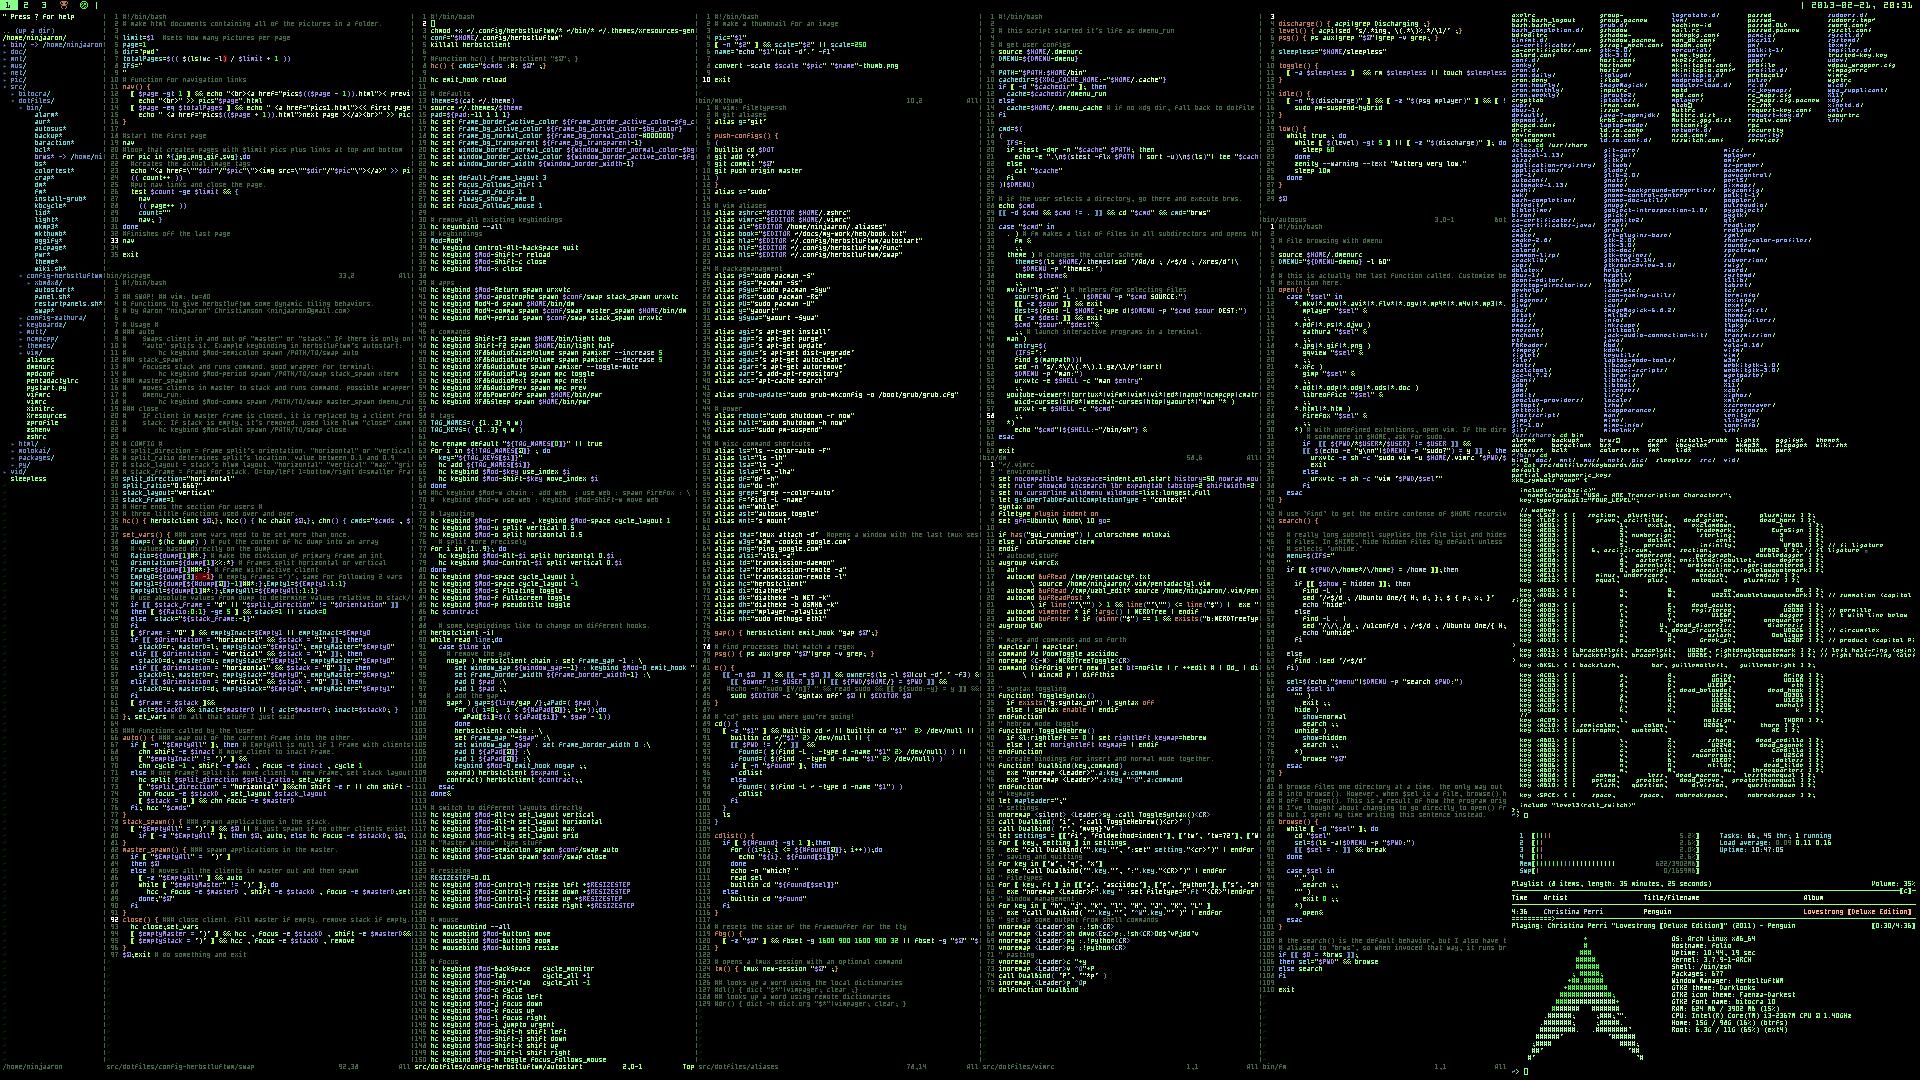 system programming wallpaper 1920x1080 43883 WallpaperUP 1920x1080